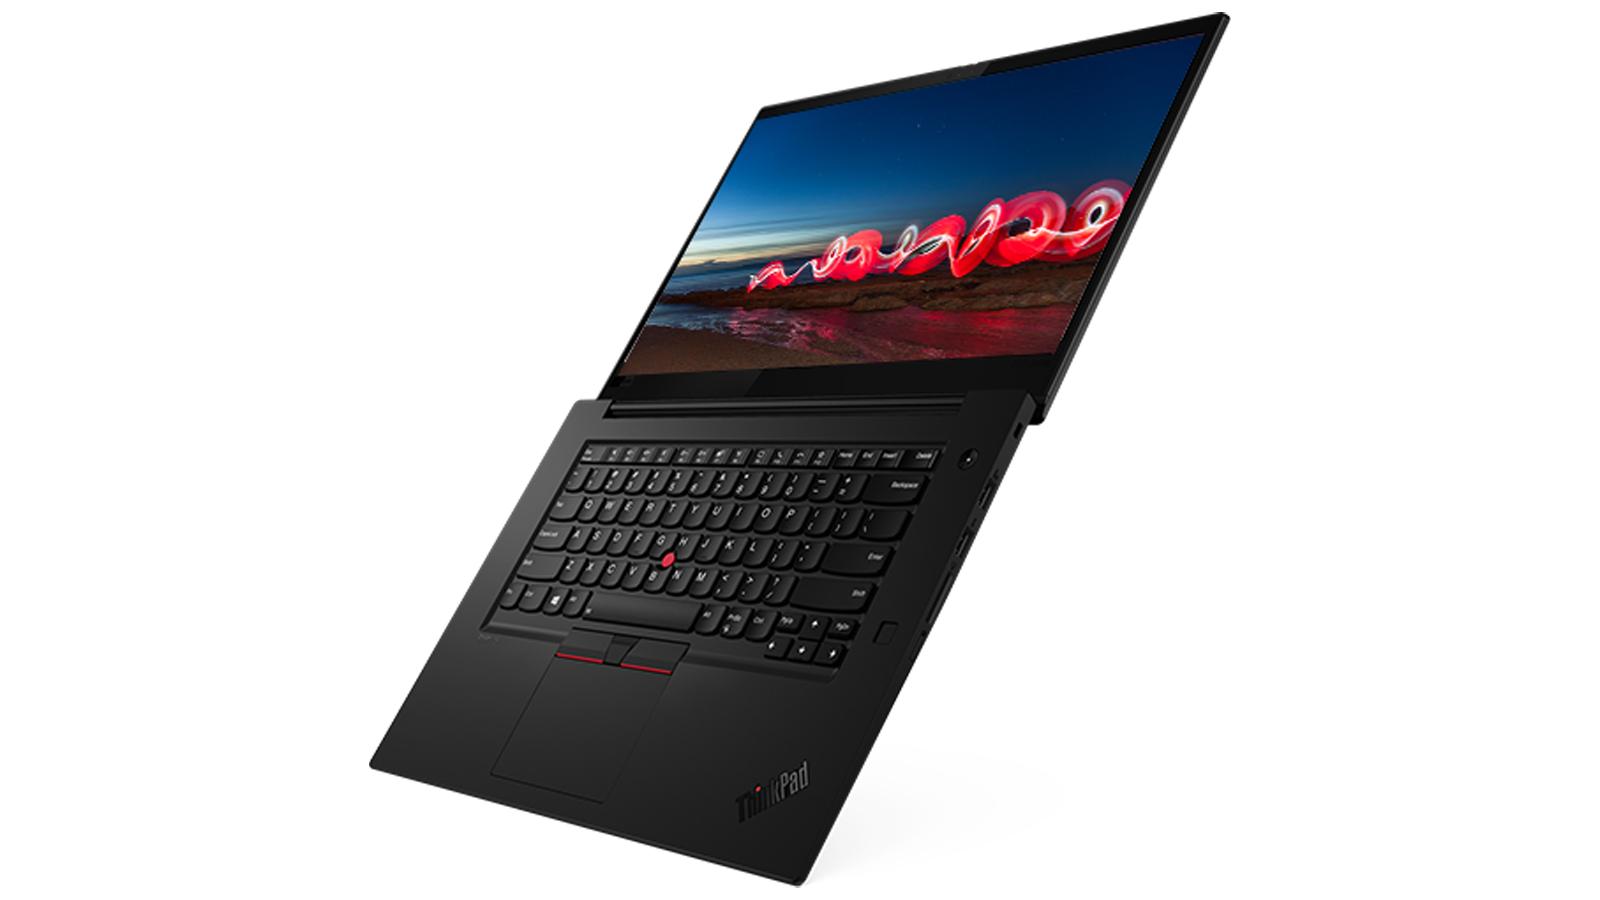 Lenovo ThinkPad X1 Extreme Gen 3 fully extended laid flat